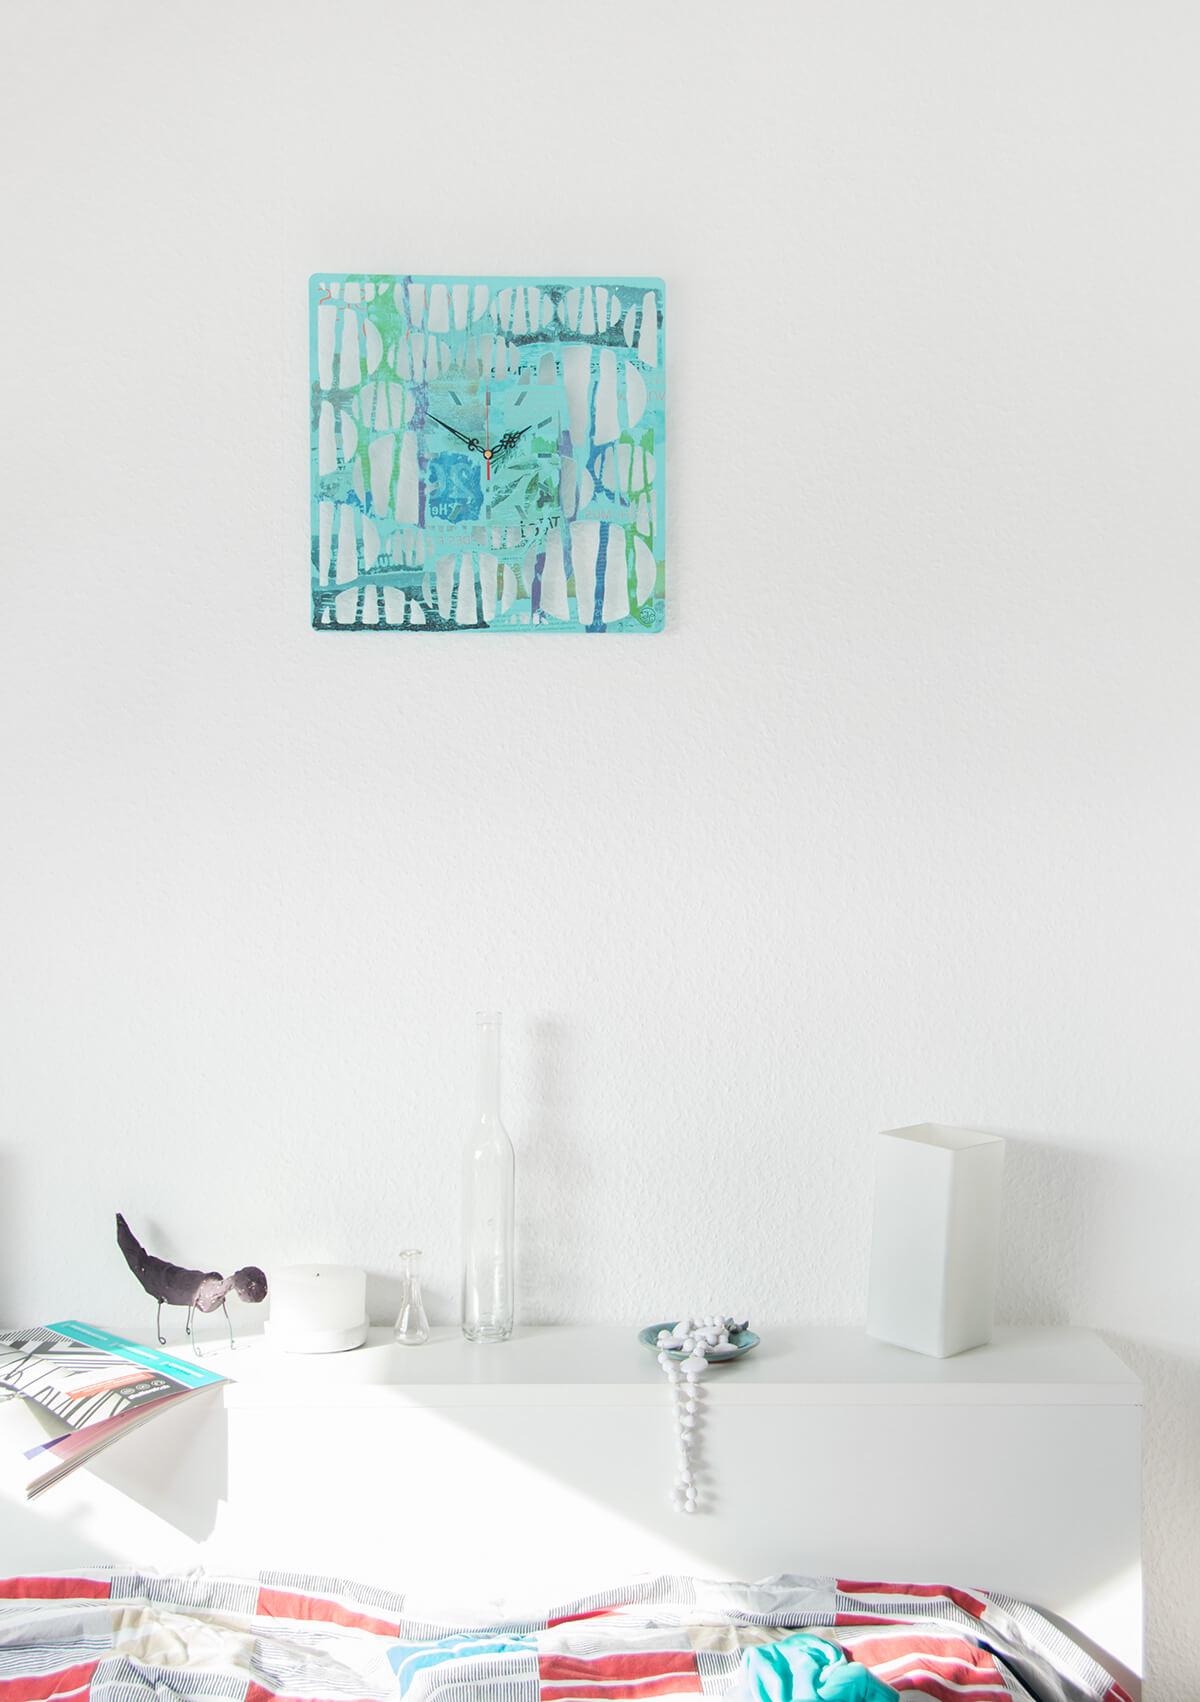 ausgefallene wanduhr aus holz waldsee wanduhren design atelier. Black Bedroom Furniture Sets. Home Design Ideas